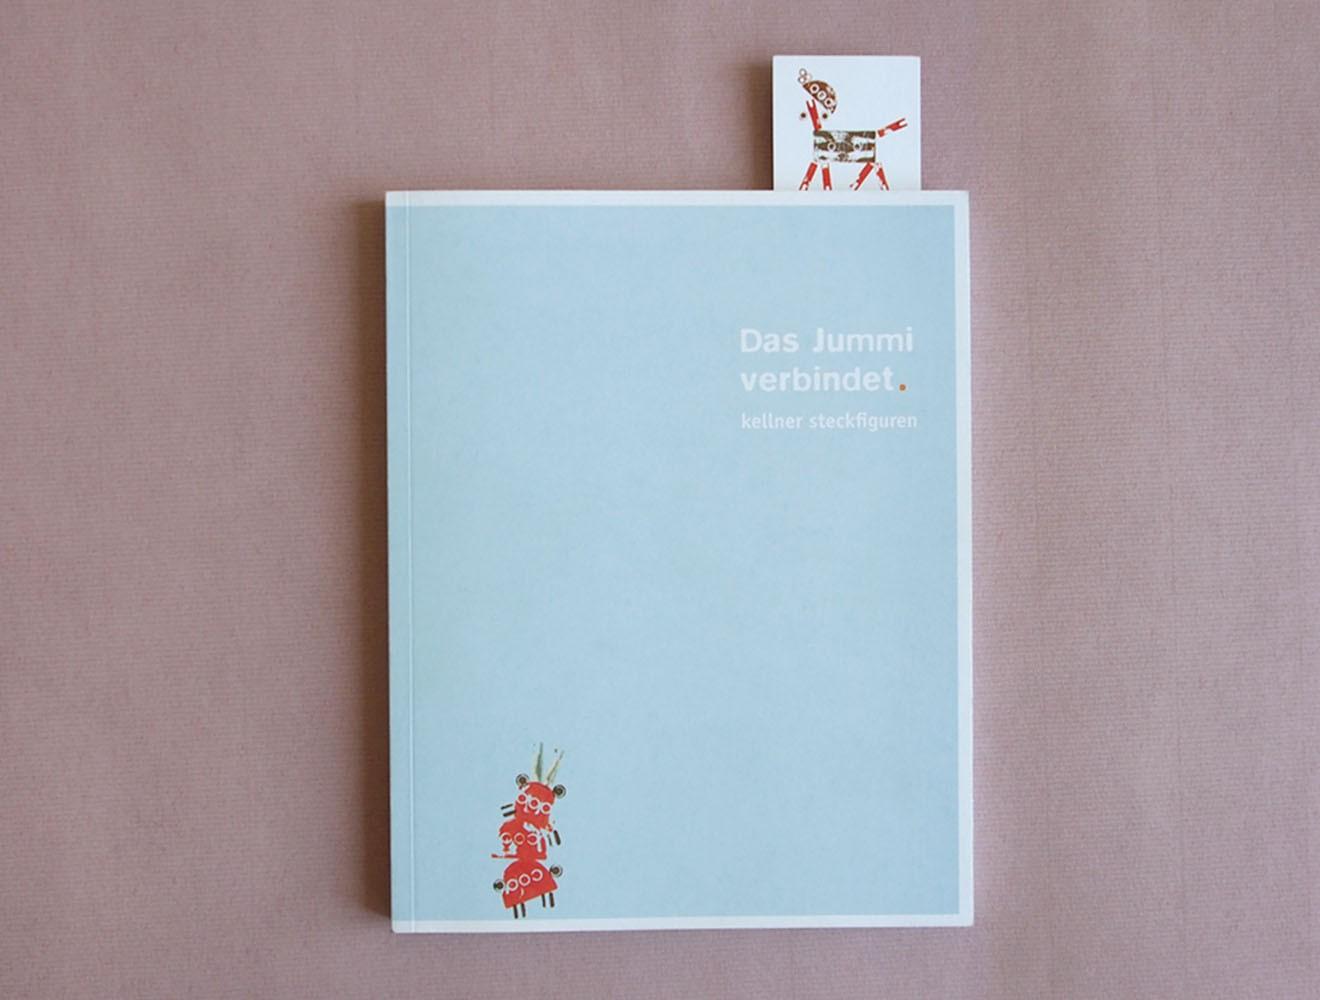 Kellner Steckfiguren // Broschüre / Titel